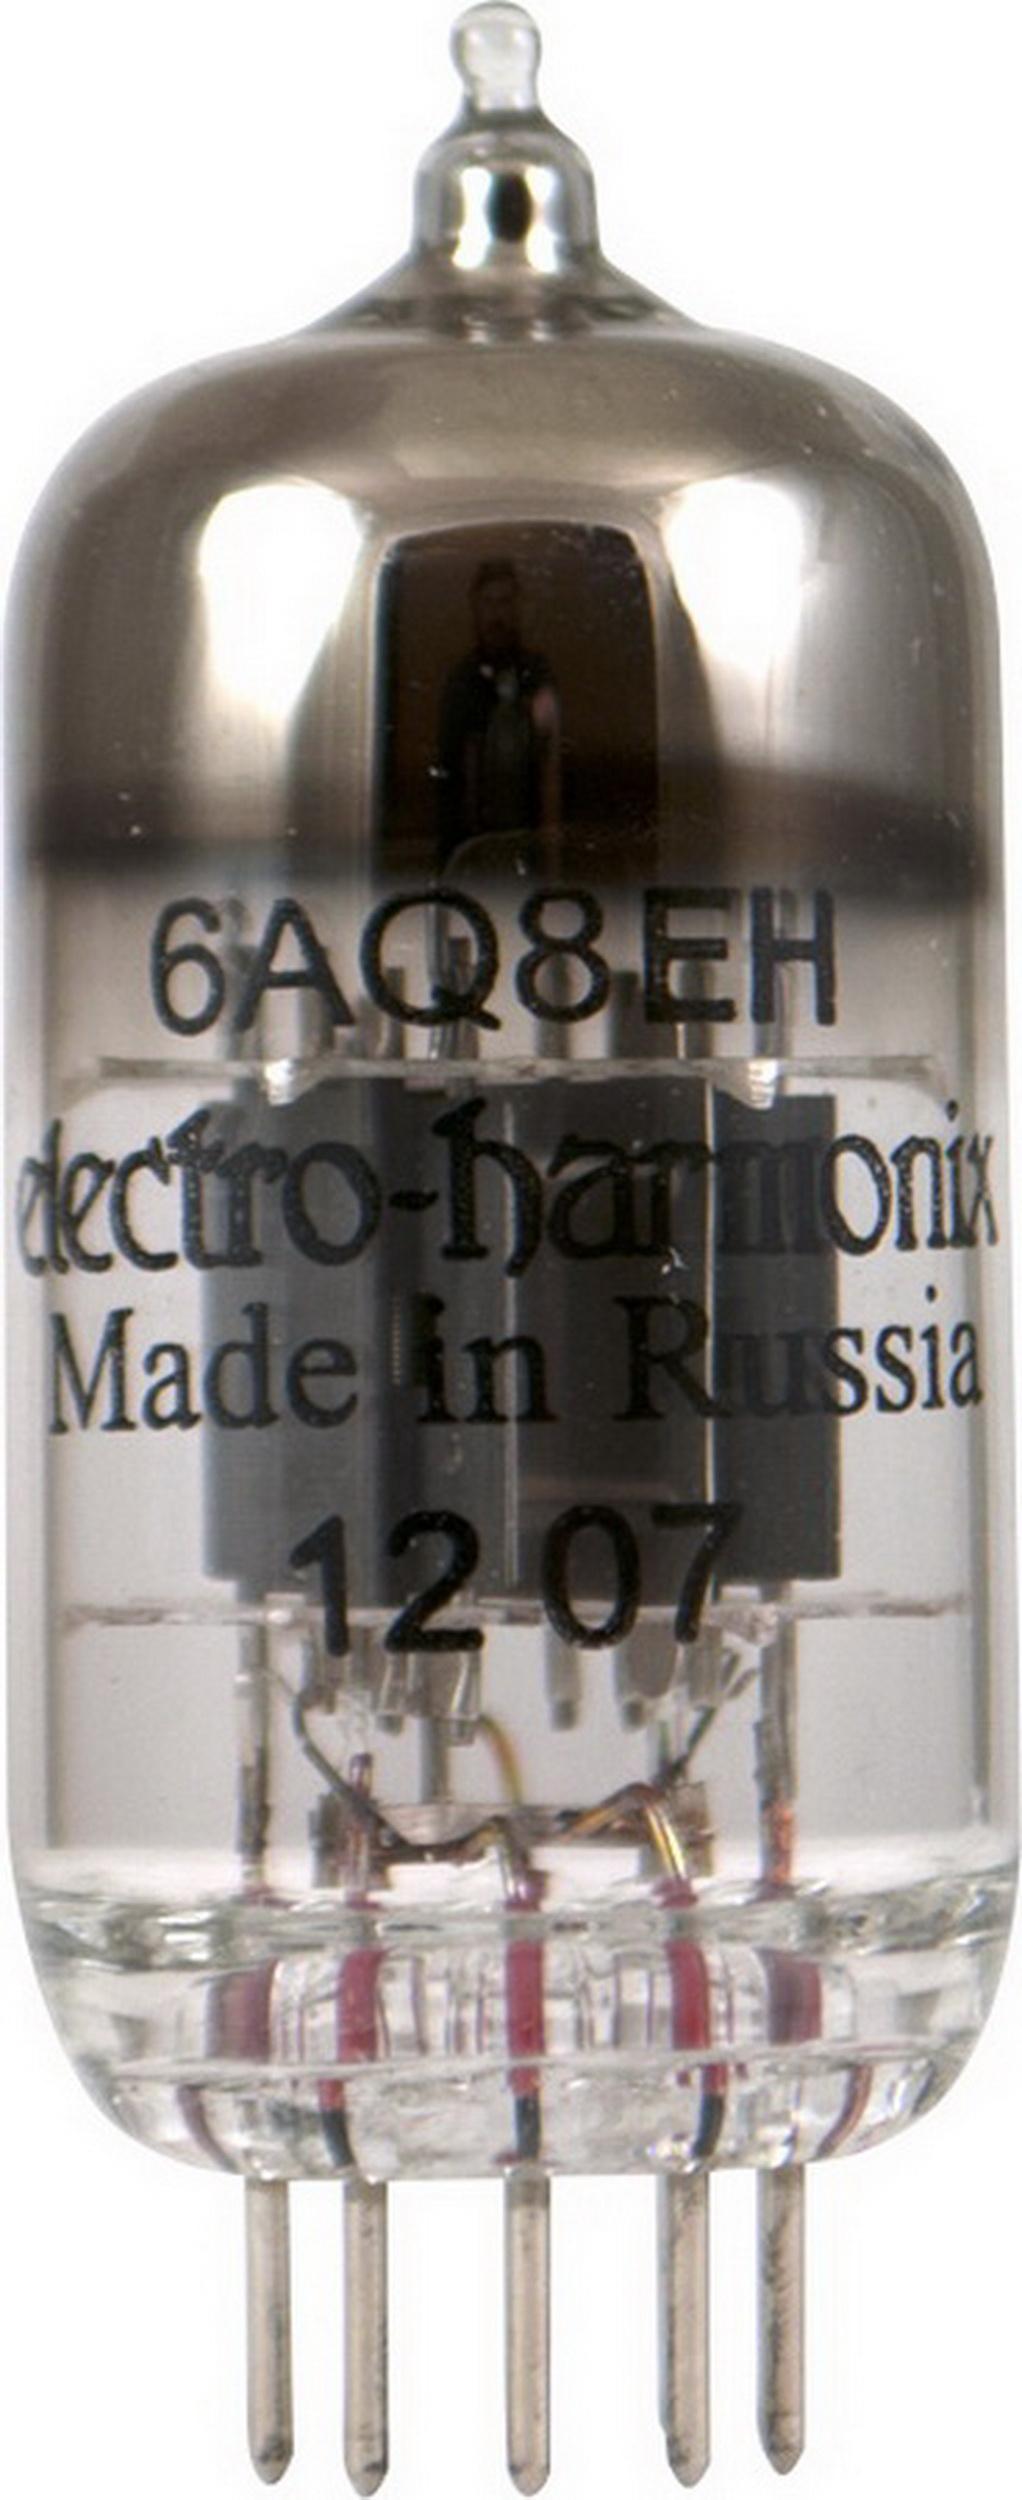 6AQ8 Electro-Harmonix by